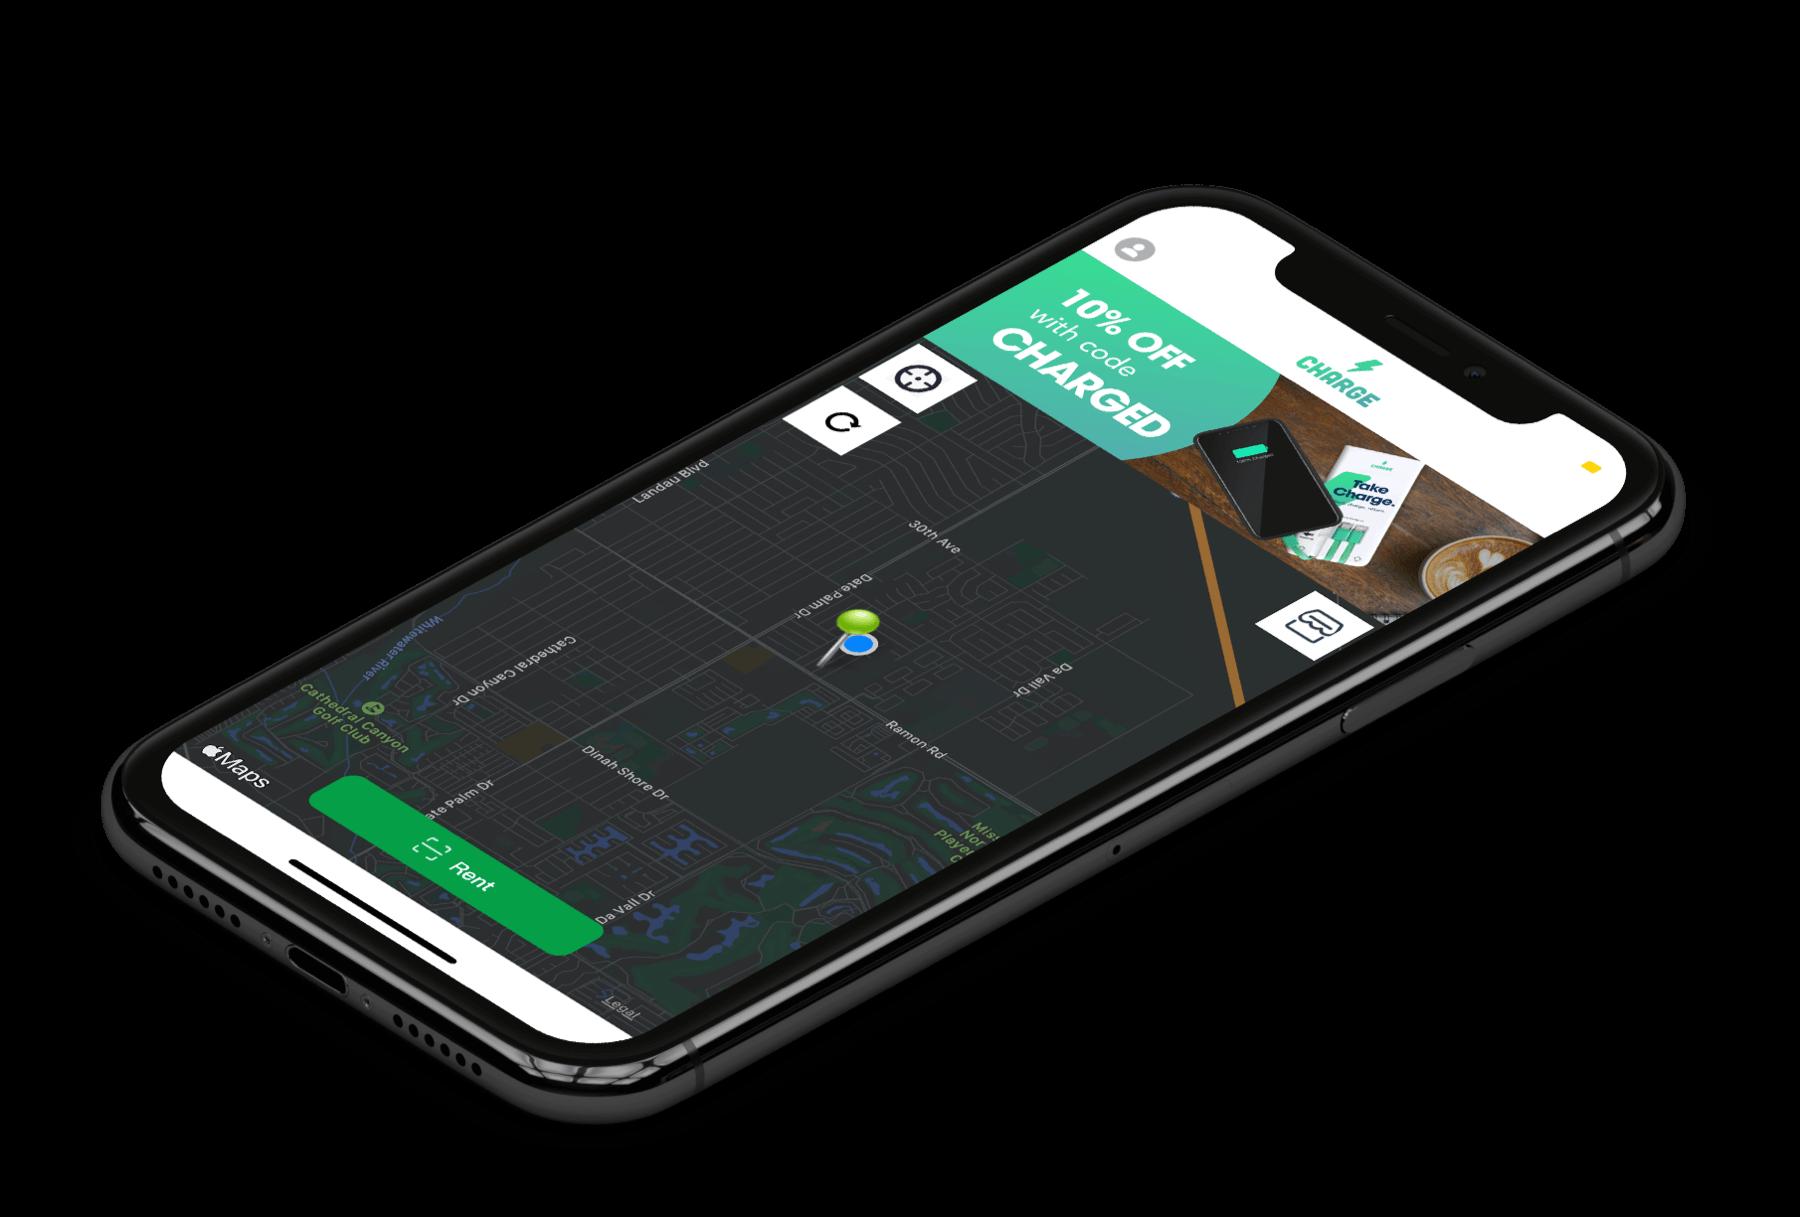 powerbanks app on iphone